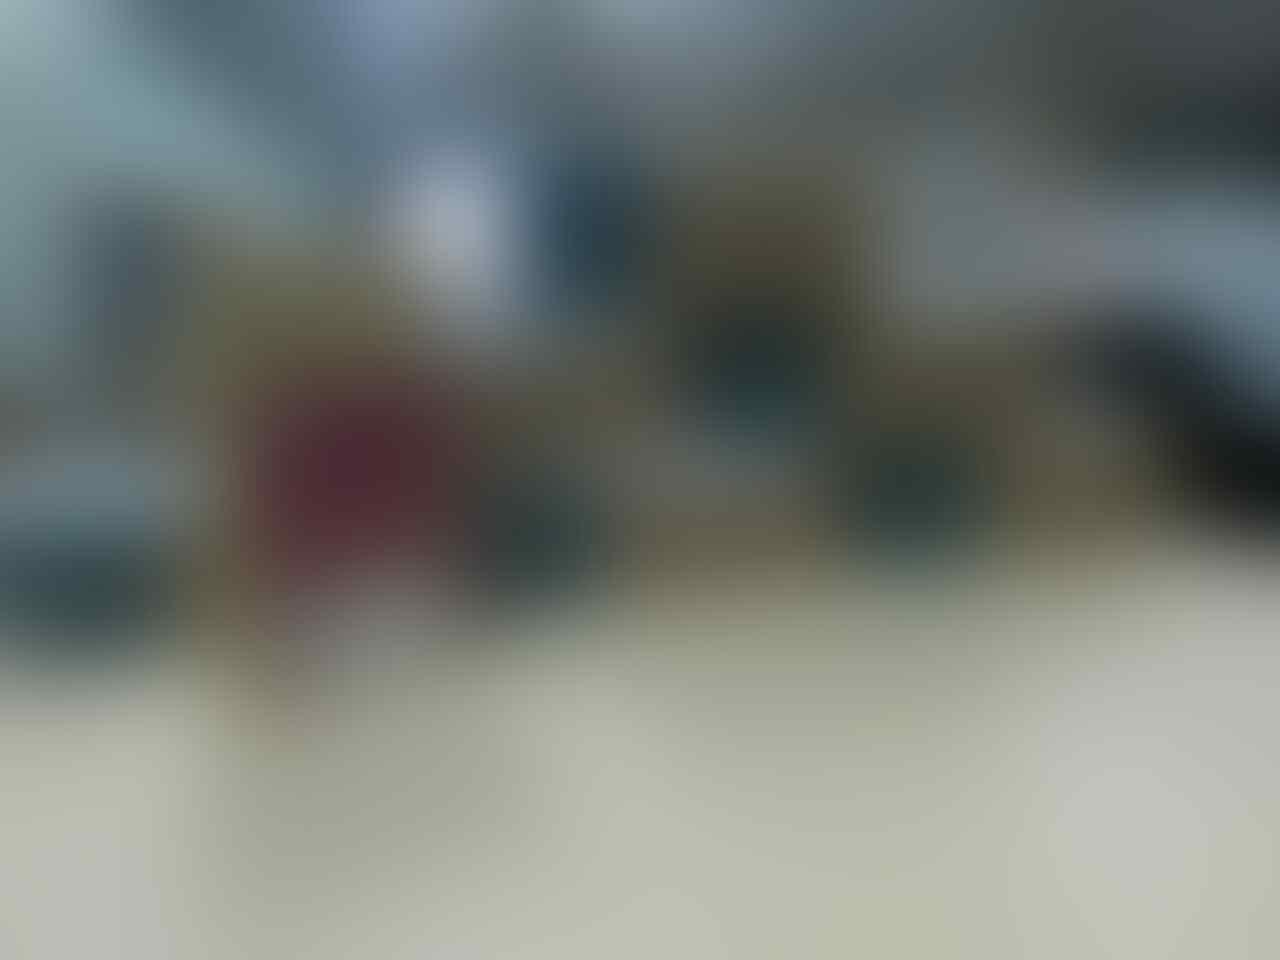 Terjual Ready Stock Asus Zenfone 4 Xiaomi Redmi 1s Piston 2 8gb Hitam Garansi Resmi Bnib Bandung